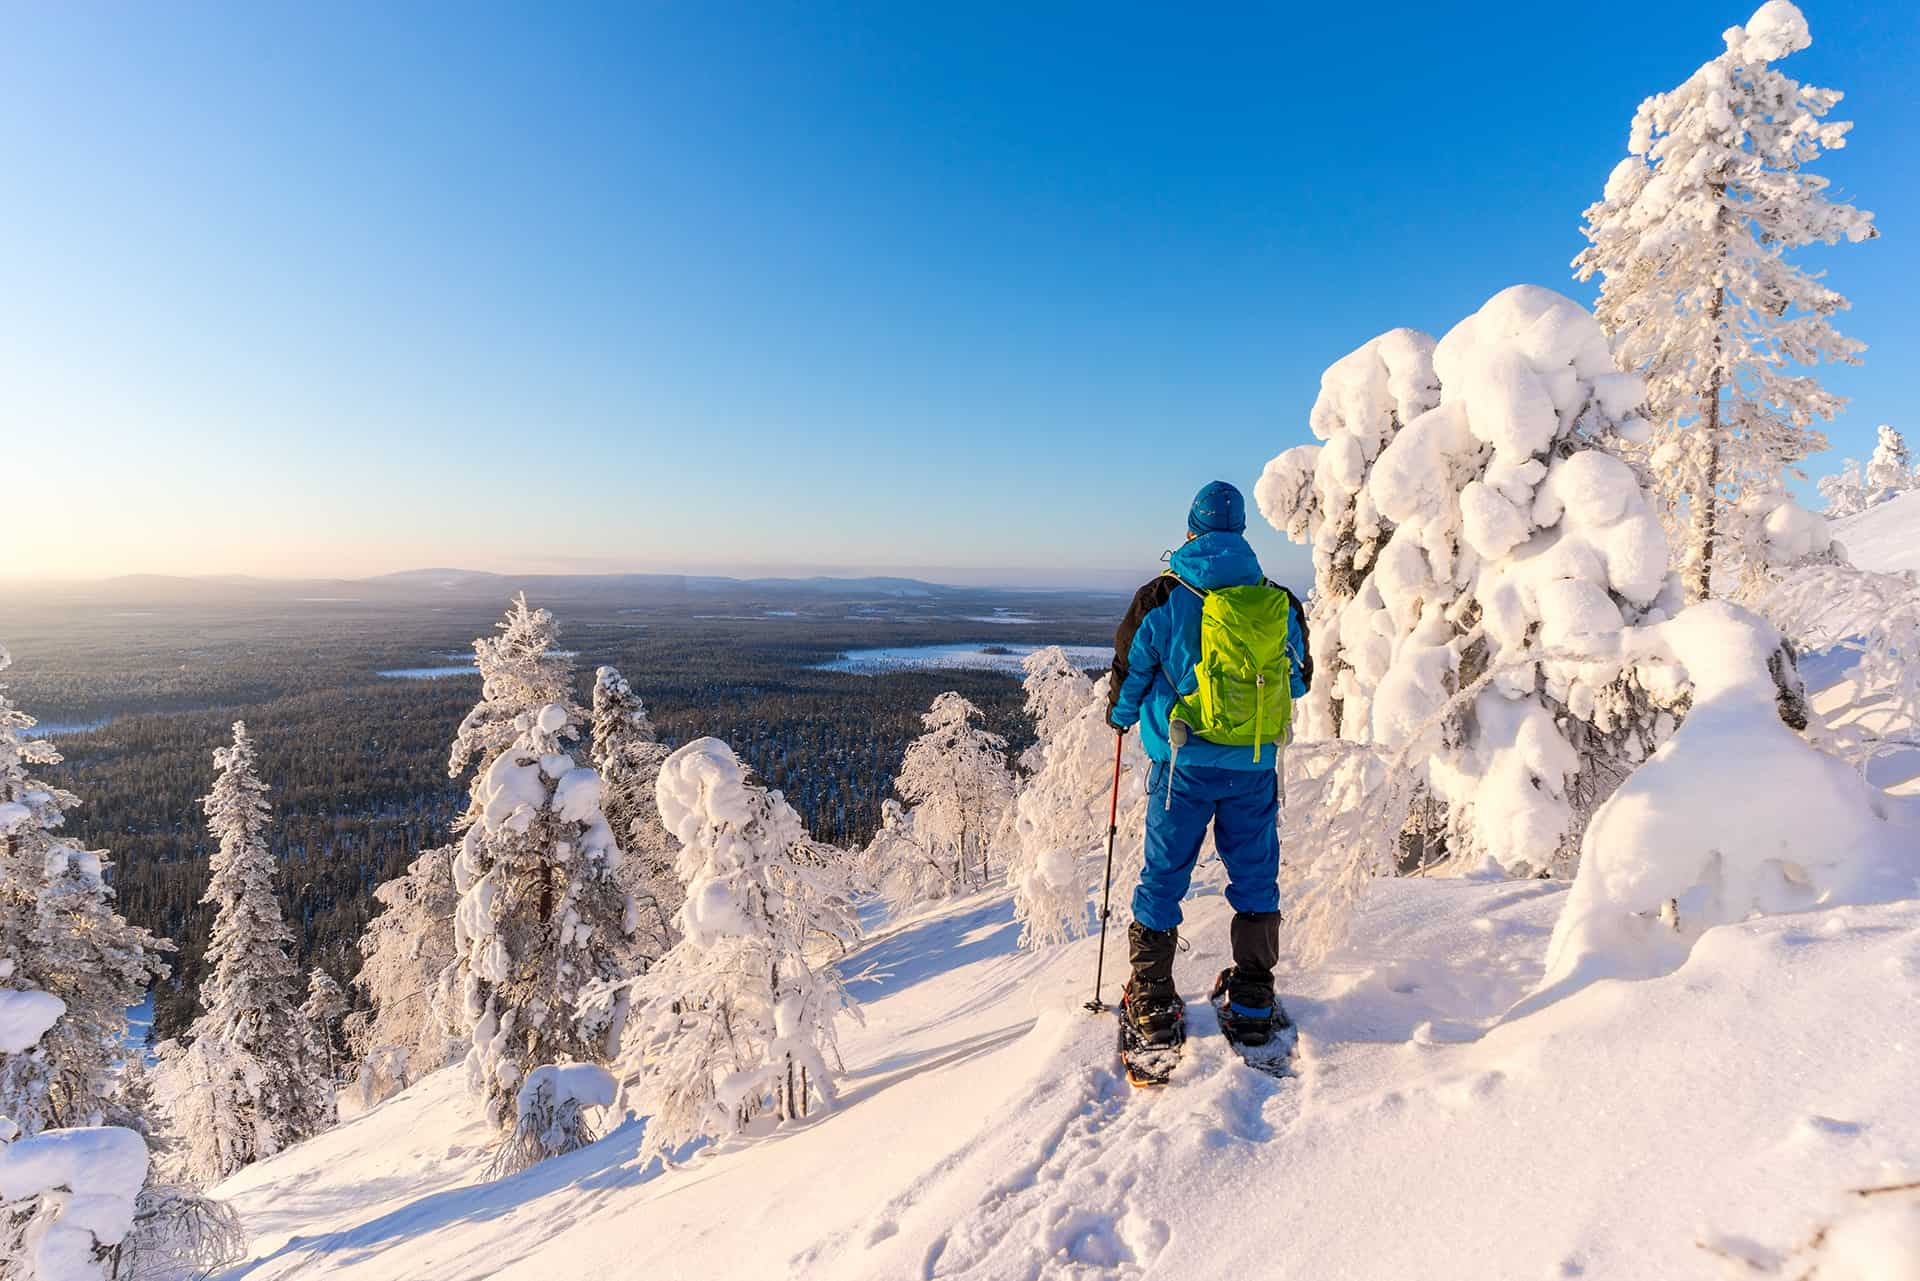 meilleure periode laponie finlandaise